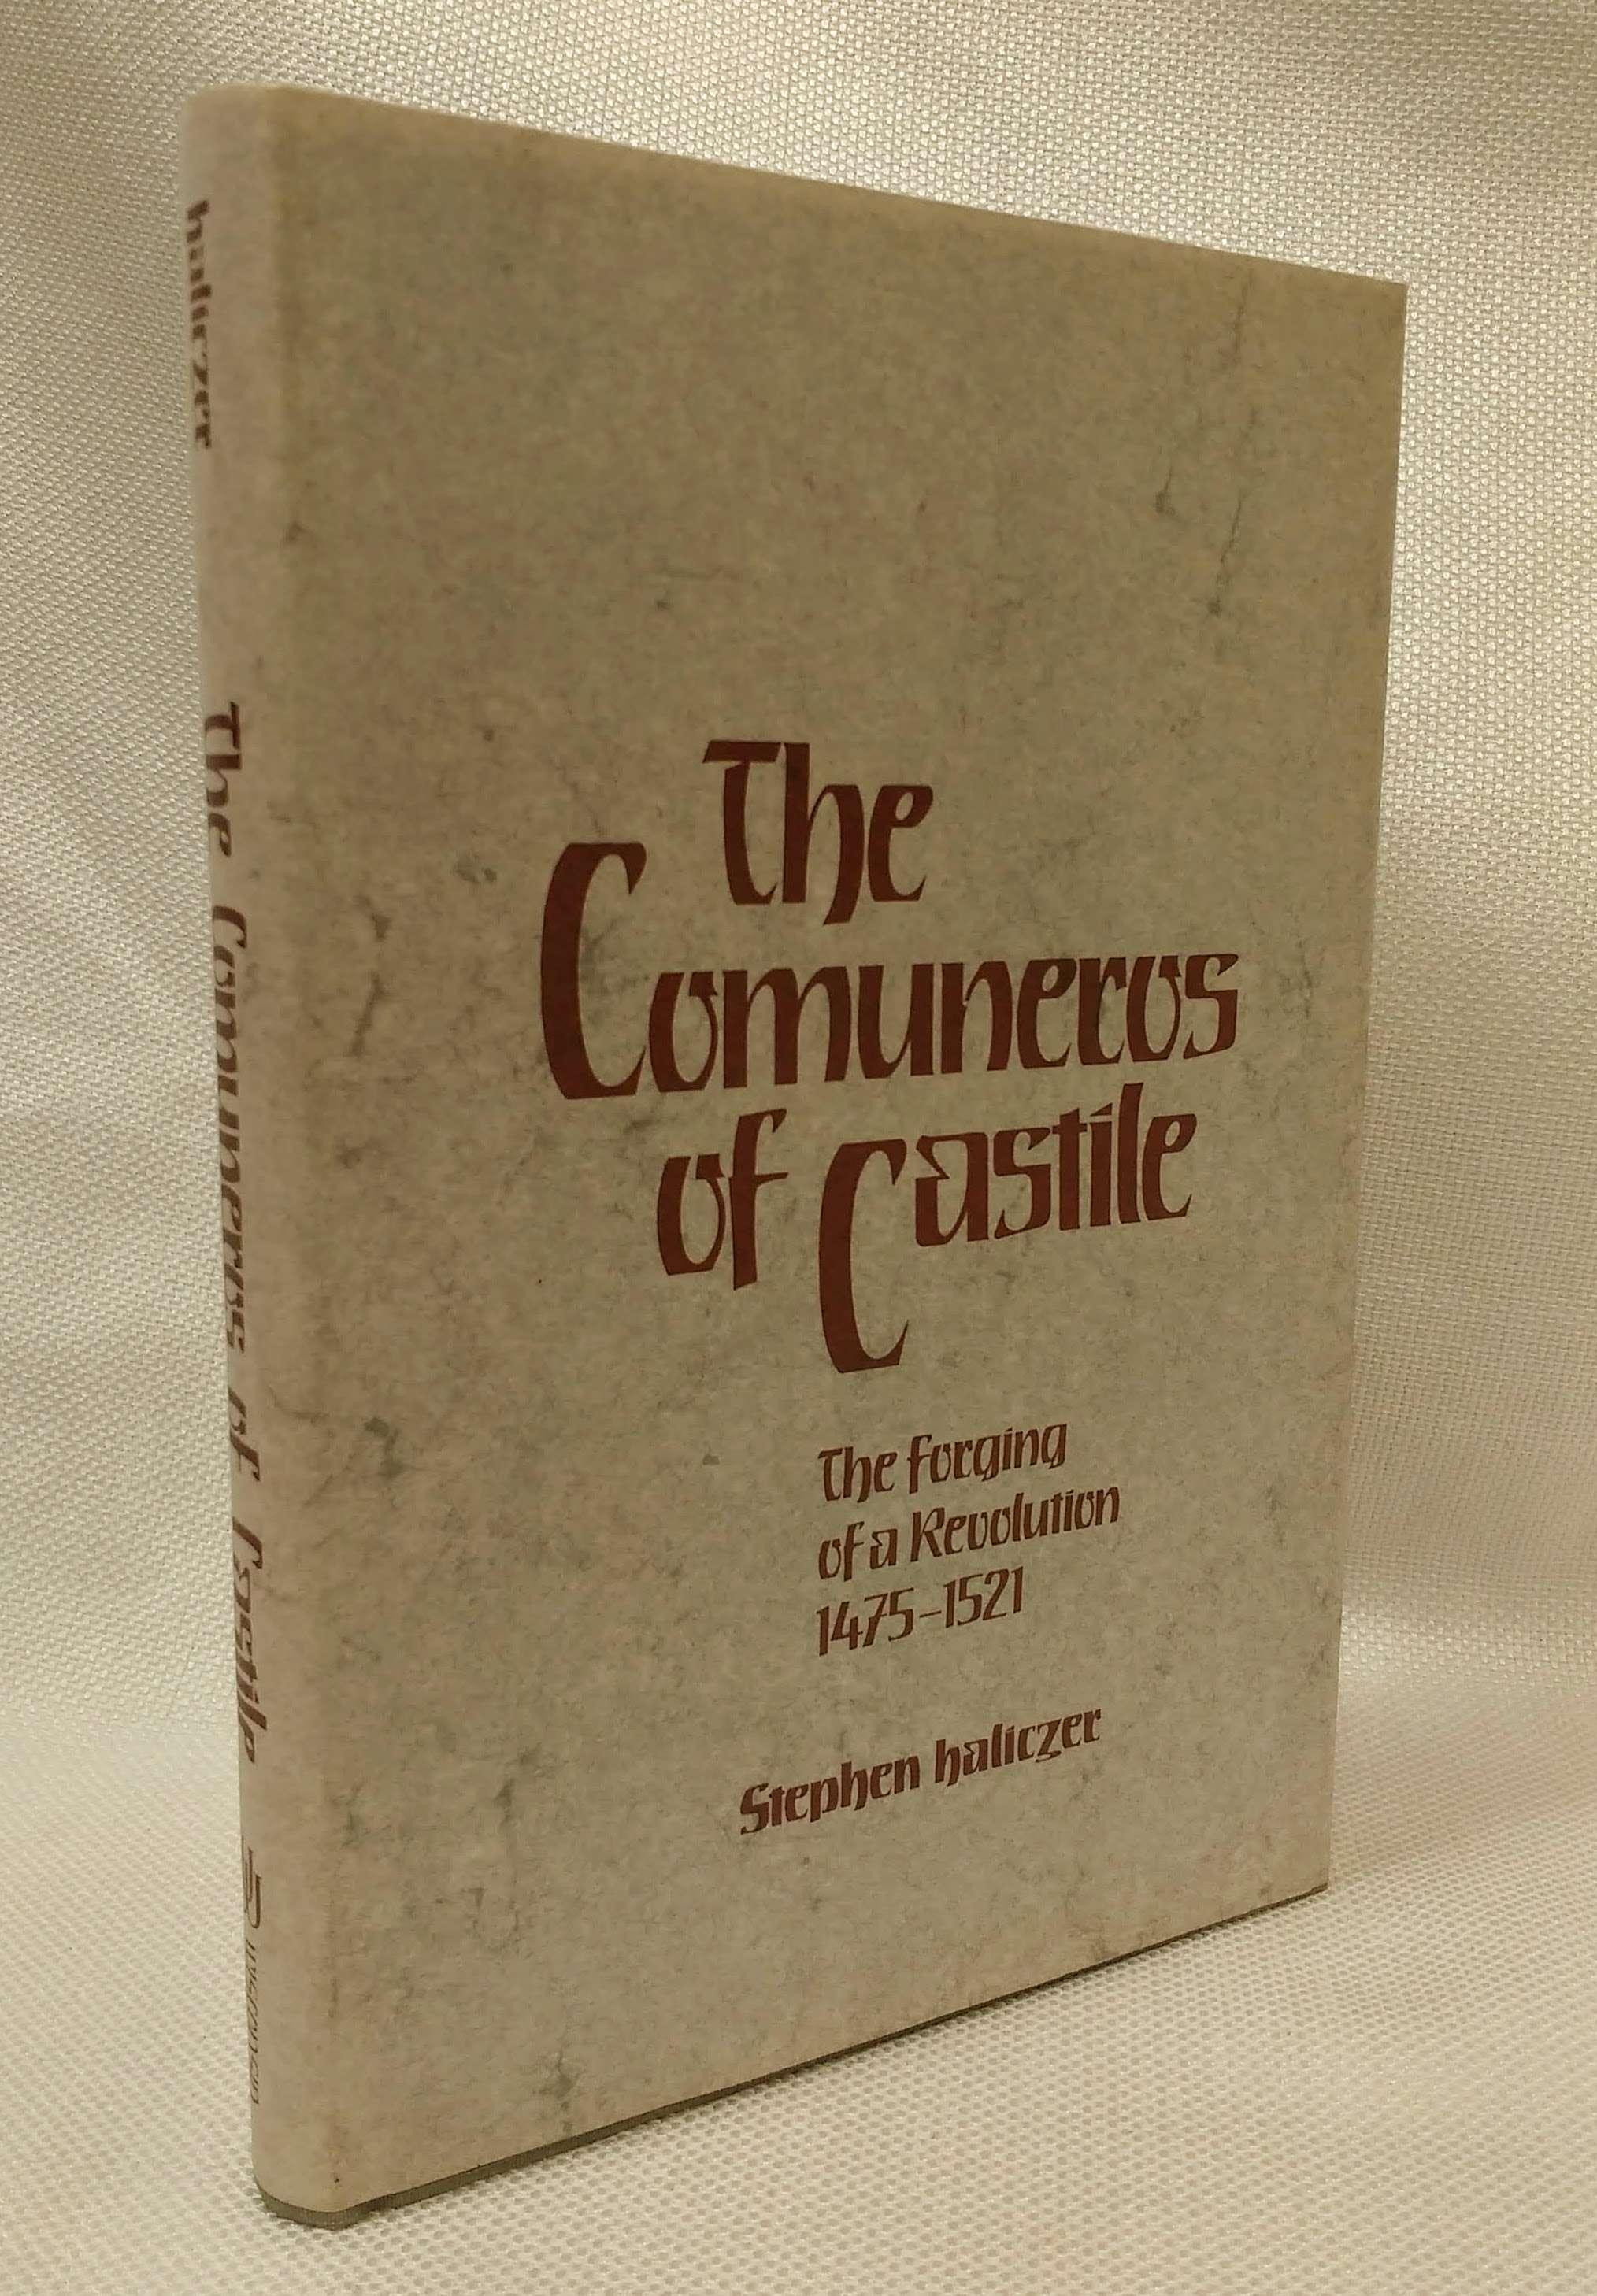 The Comuneros of Castile: The Forging of a Revolution, 1475-1521, Haliczer, Stephen